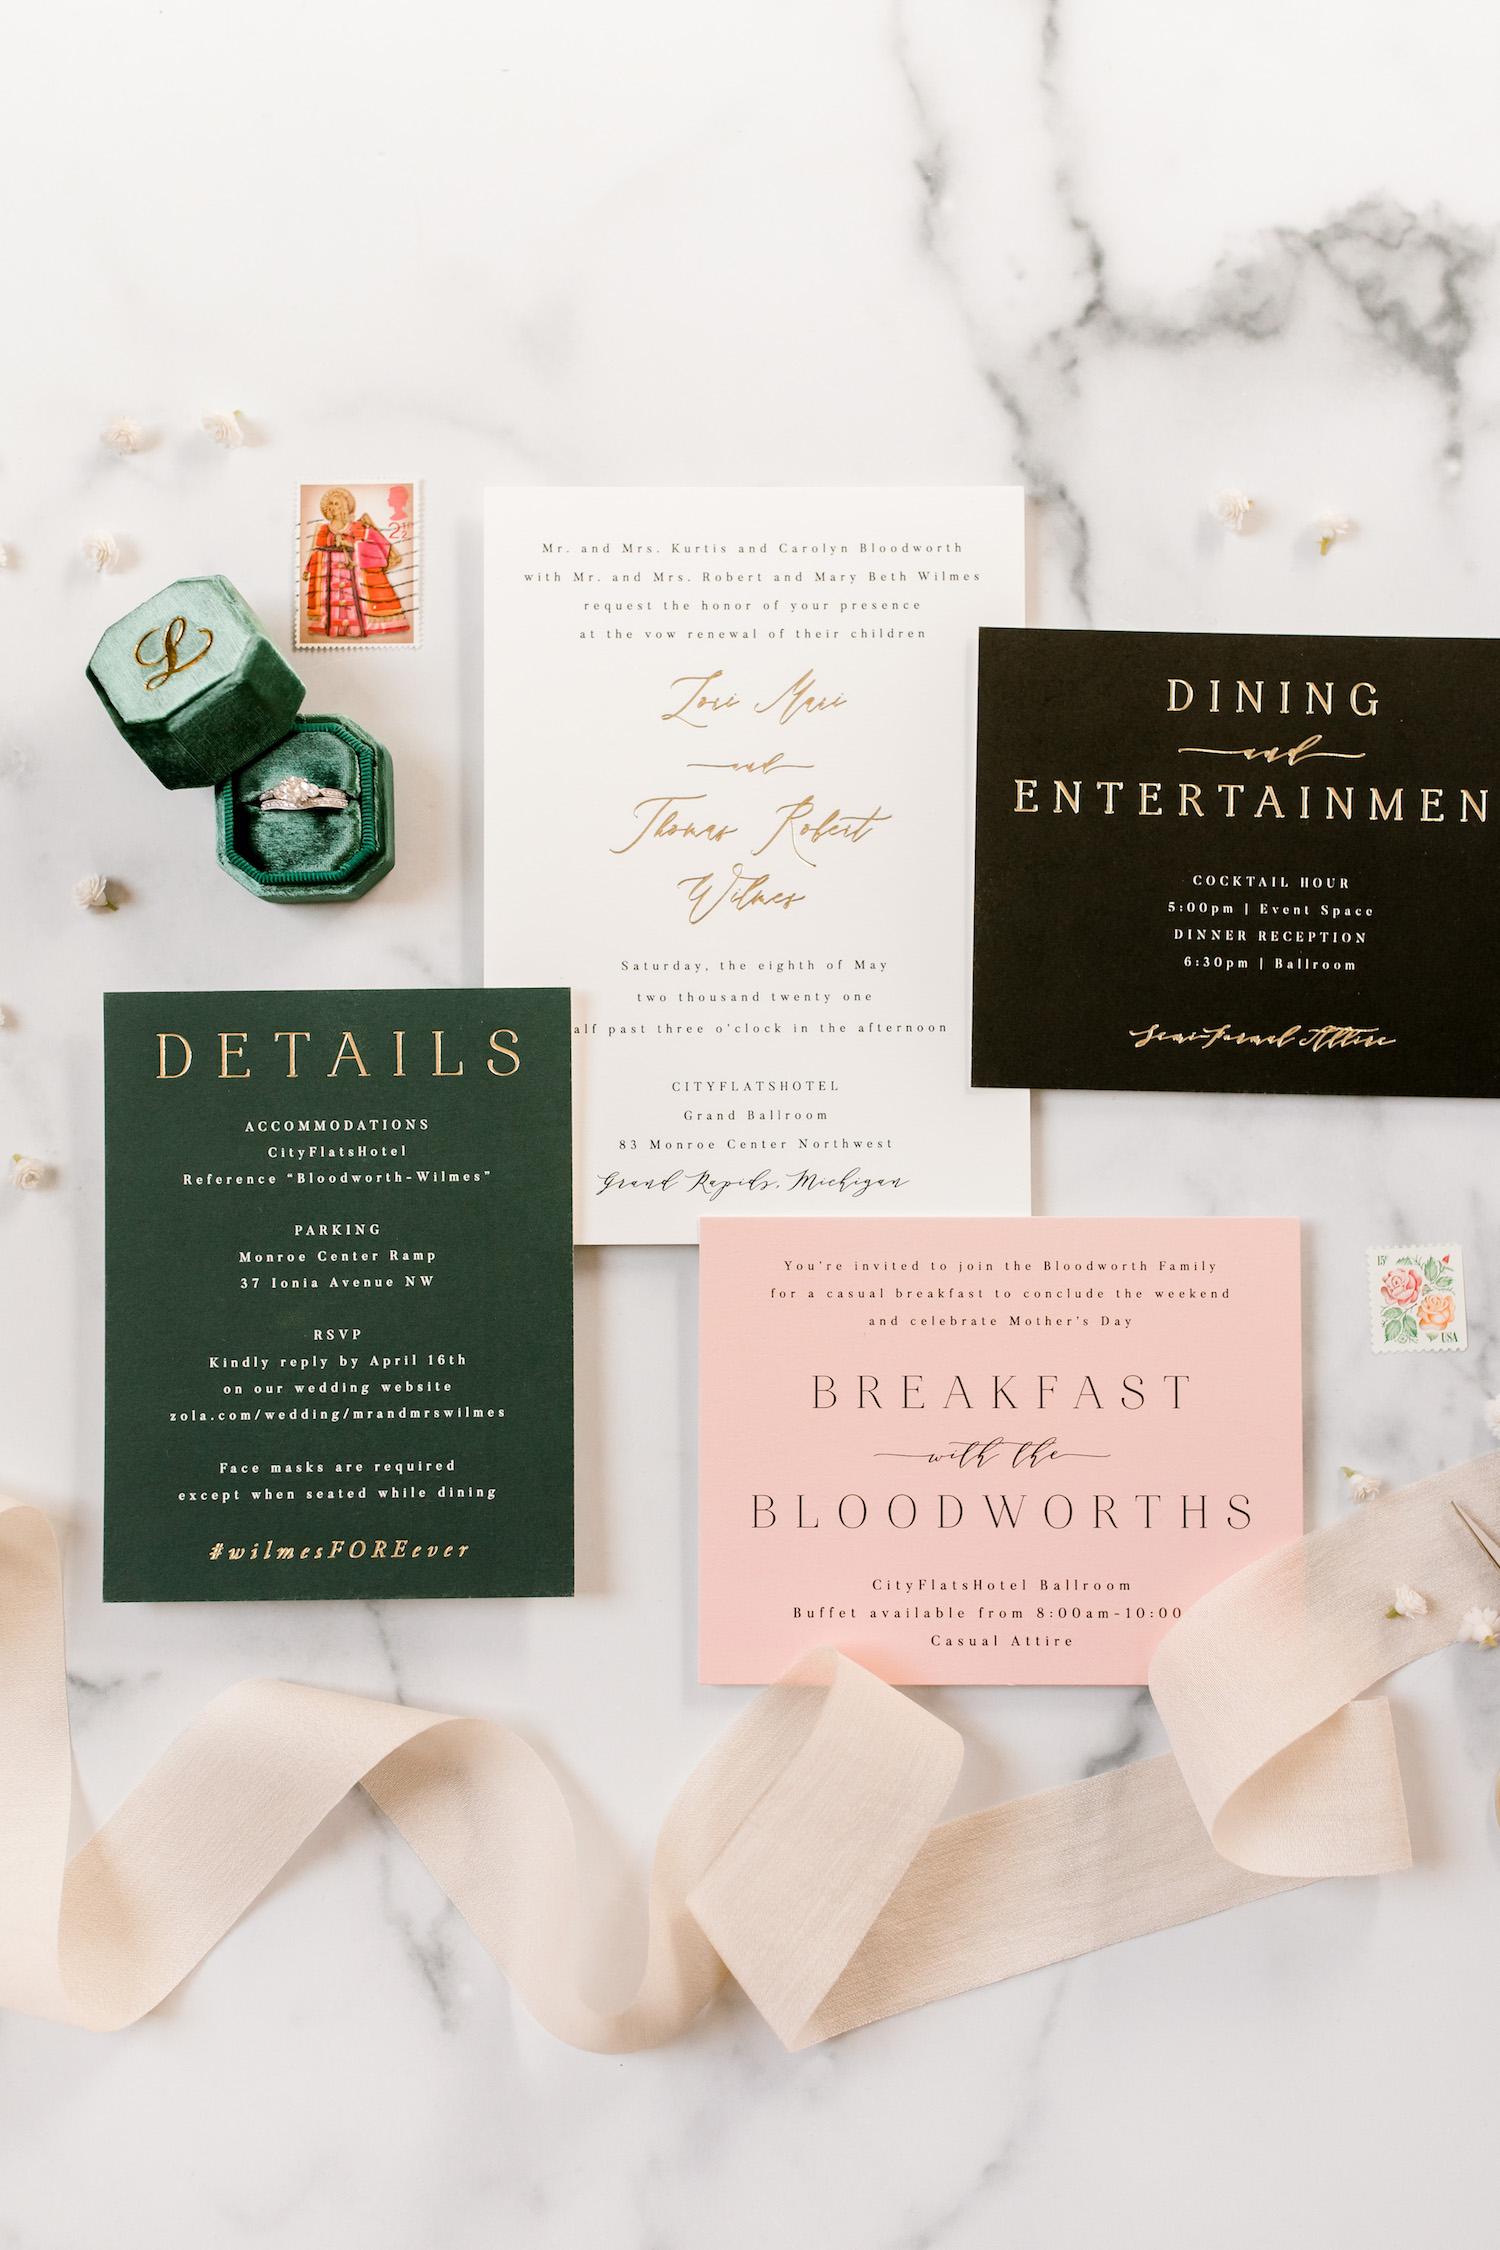 City Flats Hotel wedding stationaries and ringd